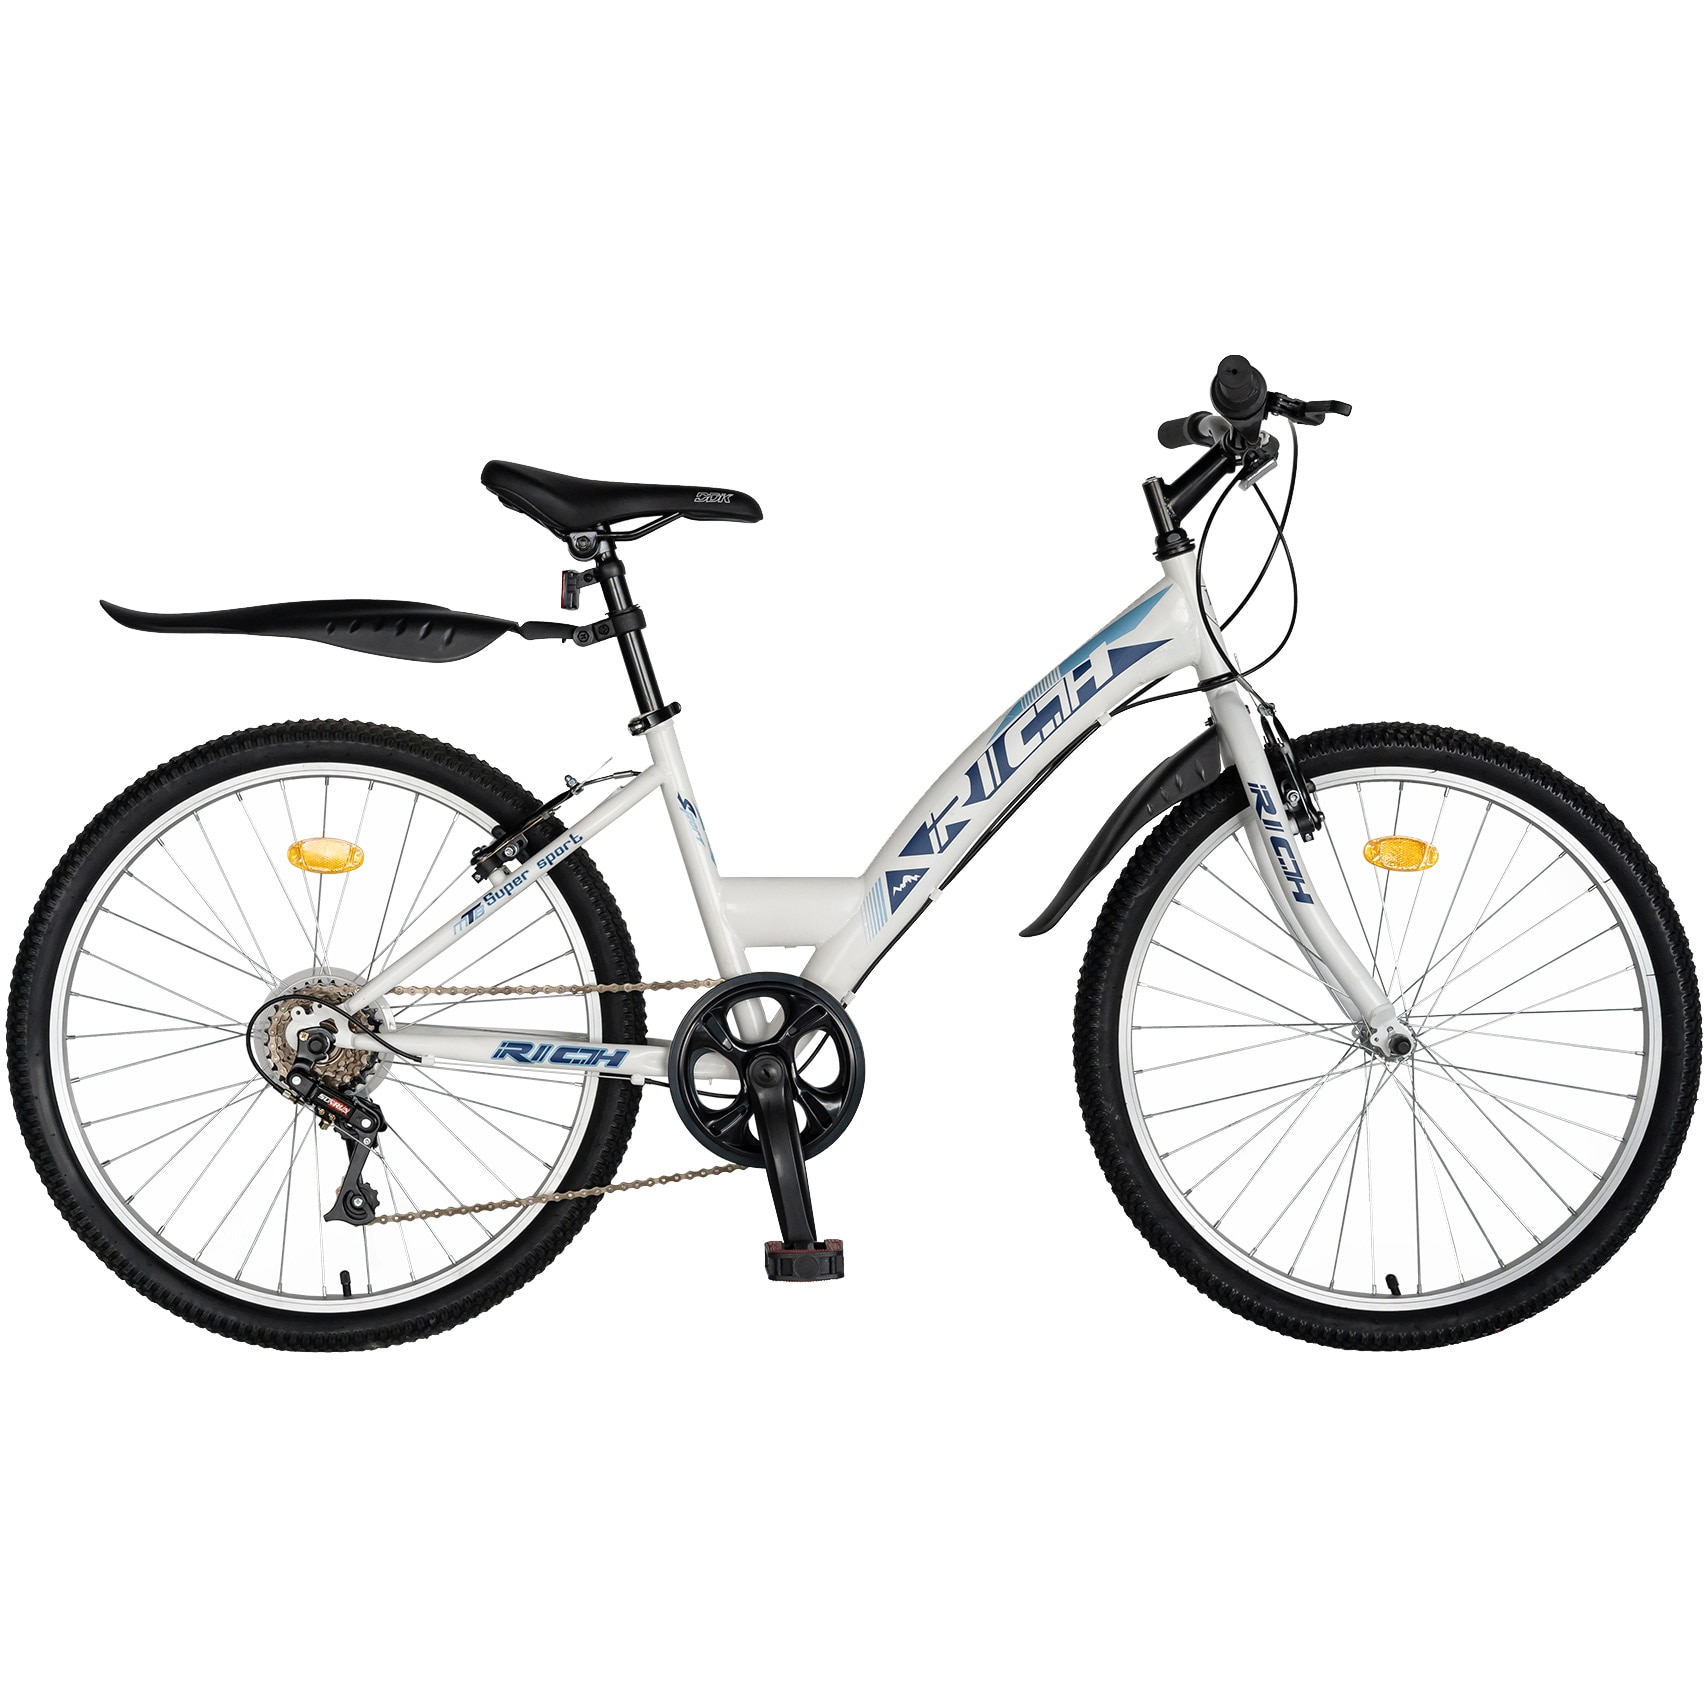 "Fotografie Bicicleta Trekking 24"" Rich R2430A, 6 viteze, culoare alb/albastru"